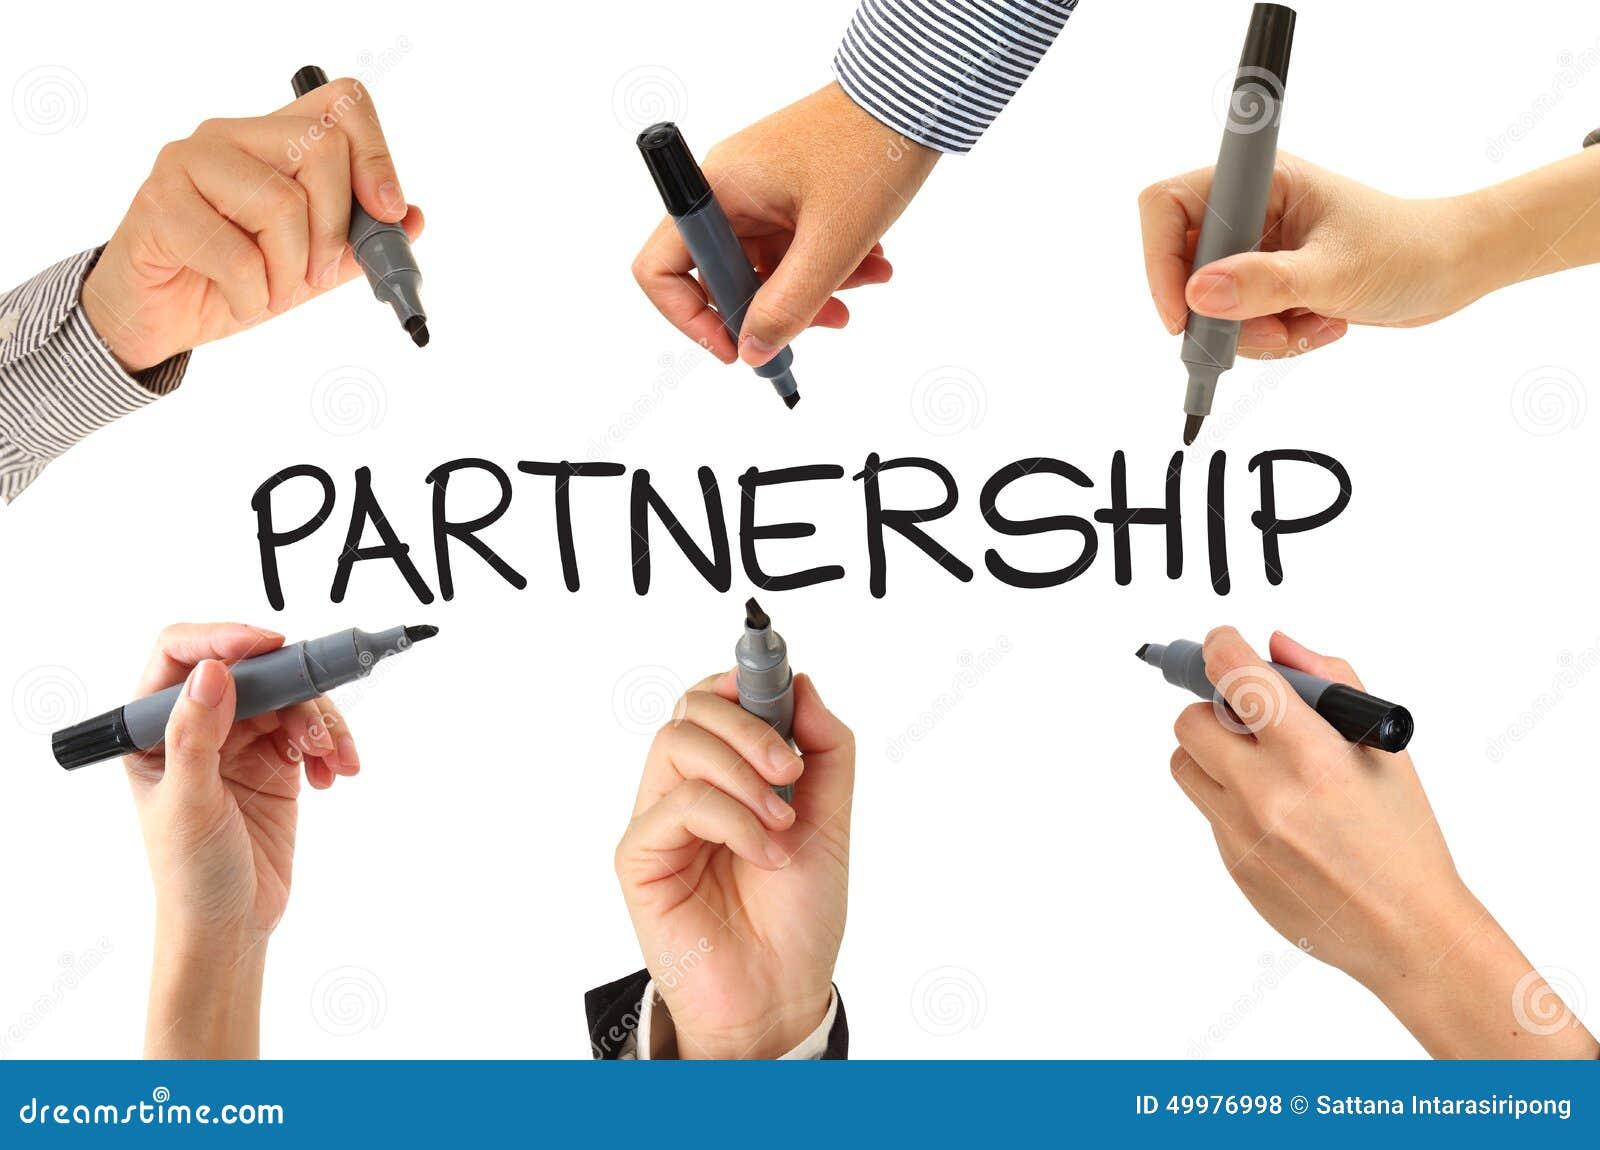 many hands writing partnership word stock photo - image of